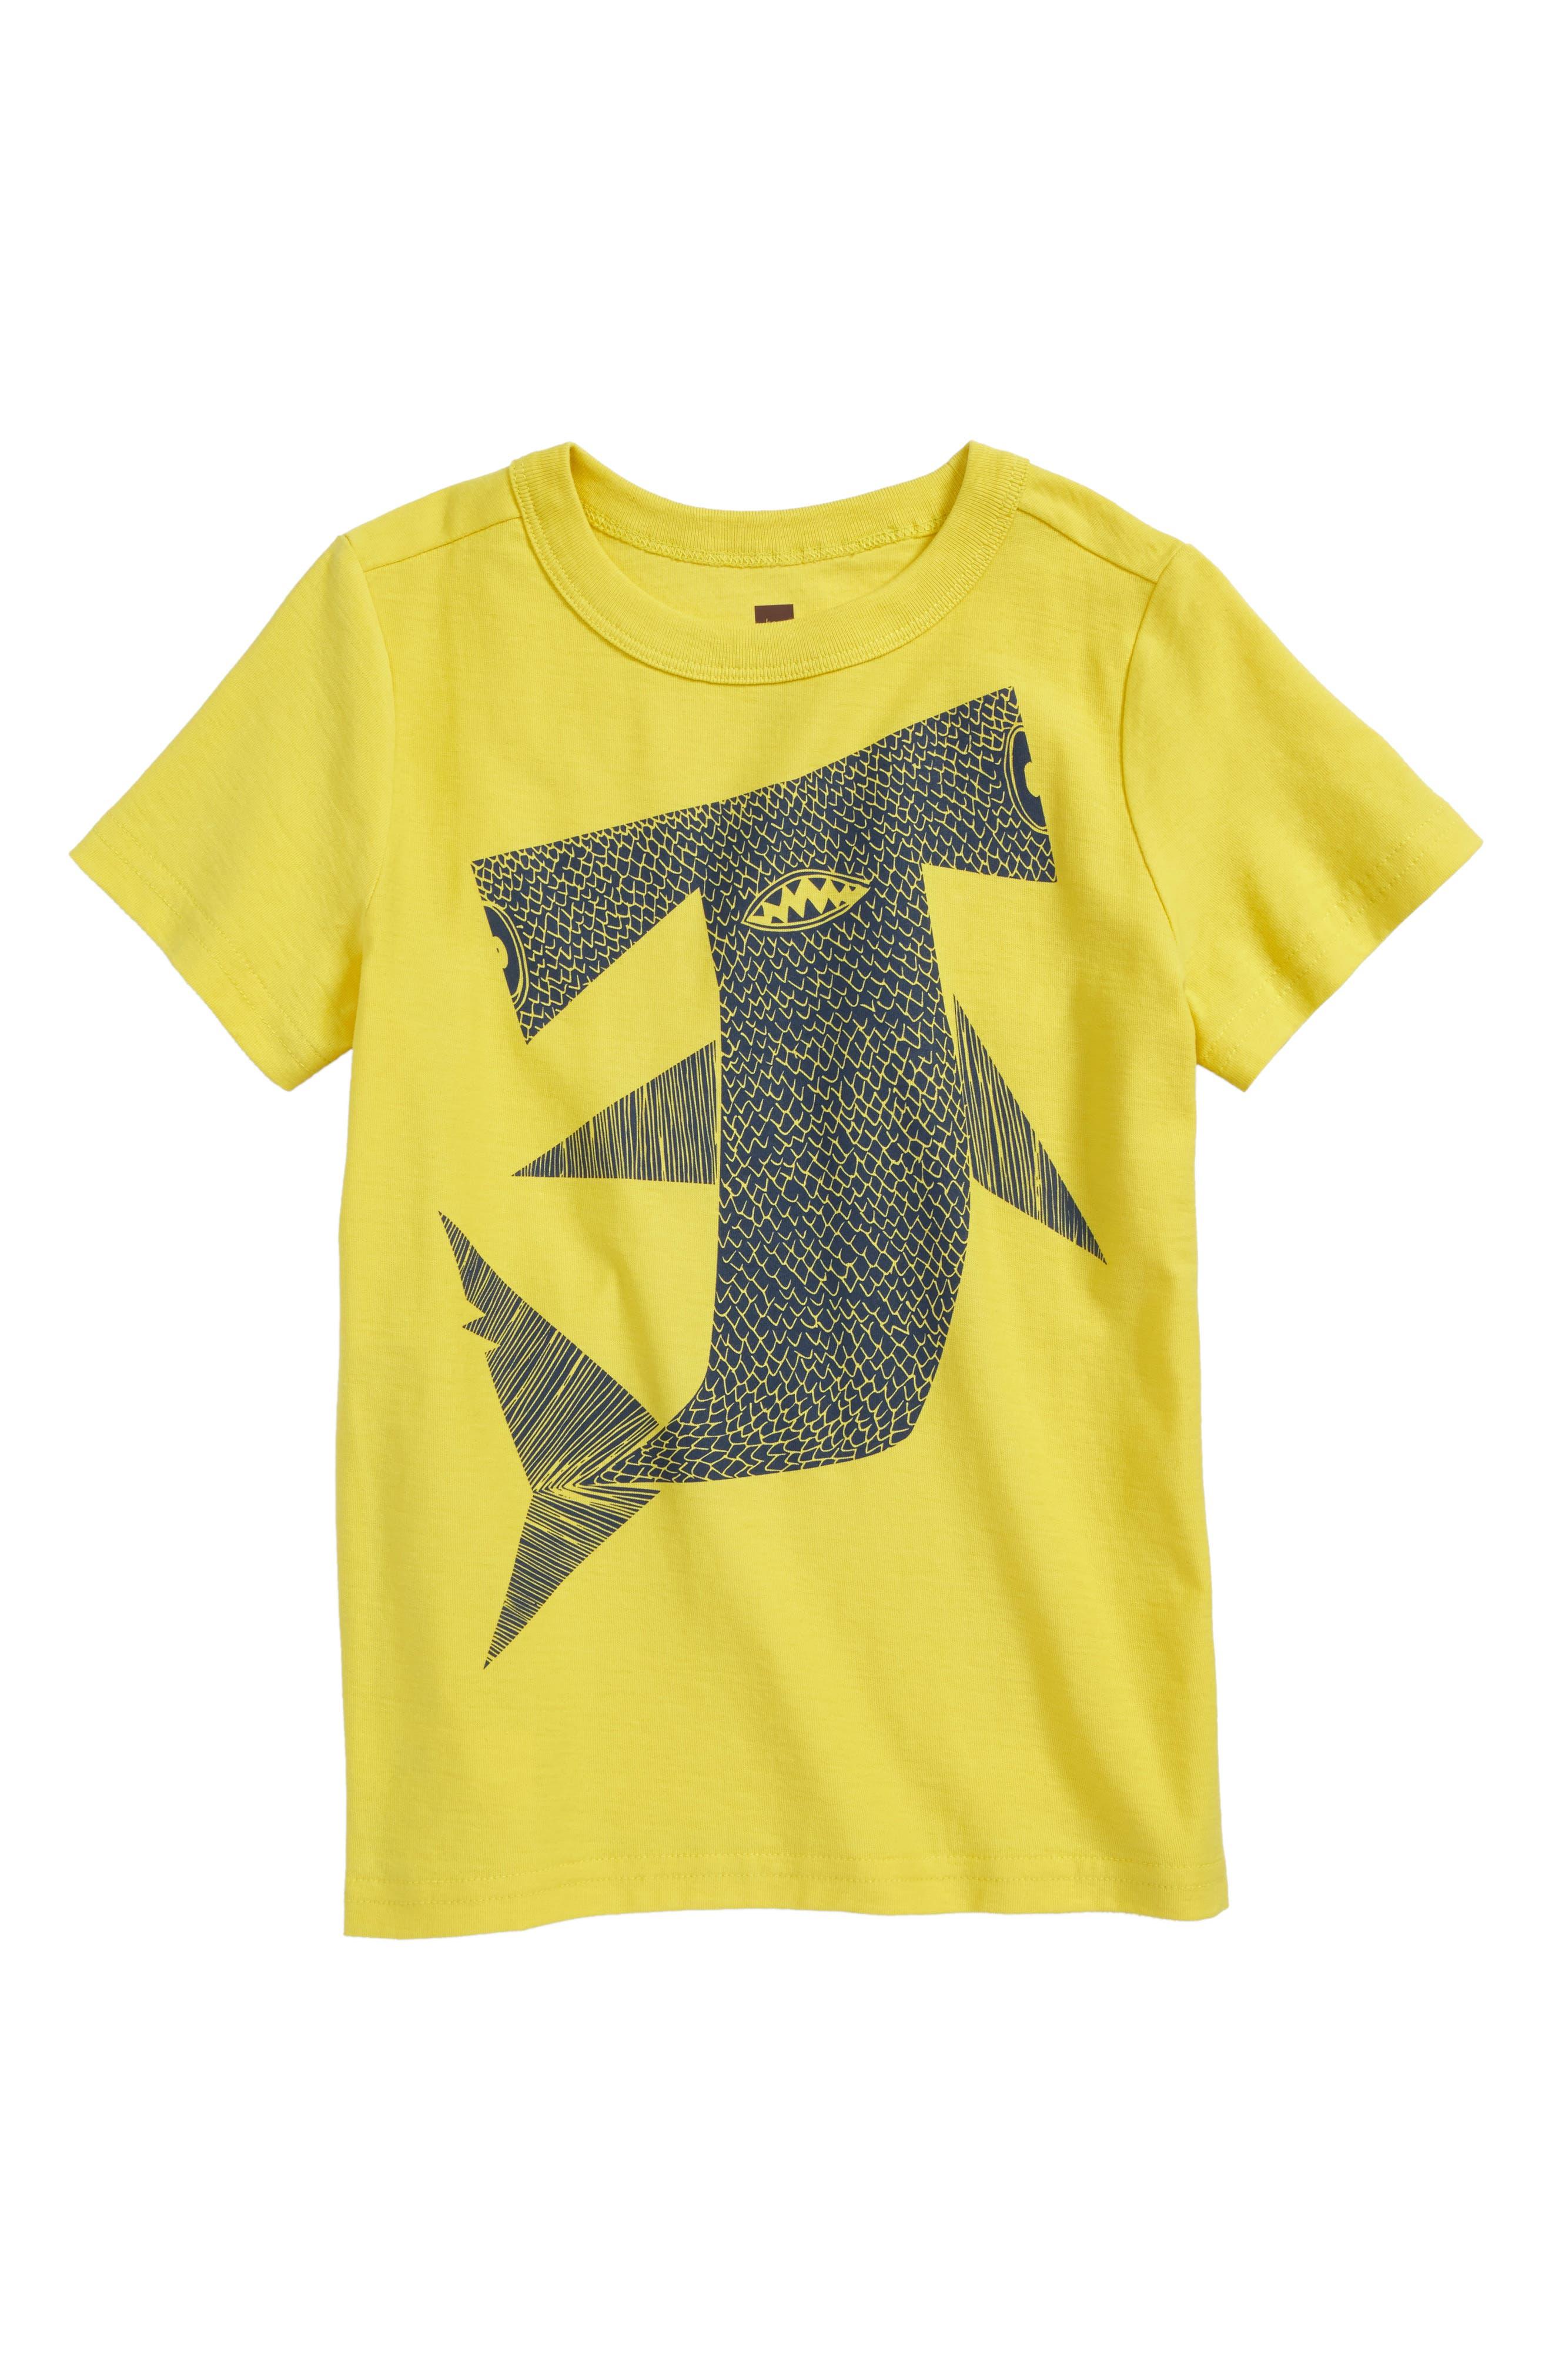 Hammer Time T-Shirt,                             Main thumbnail 1, color,                             High Visibility